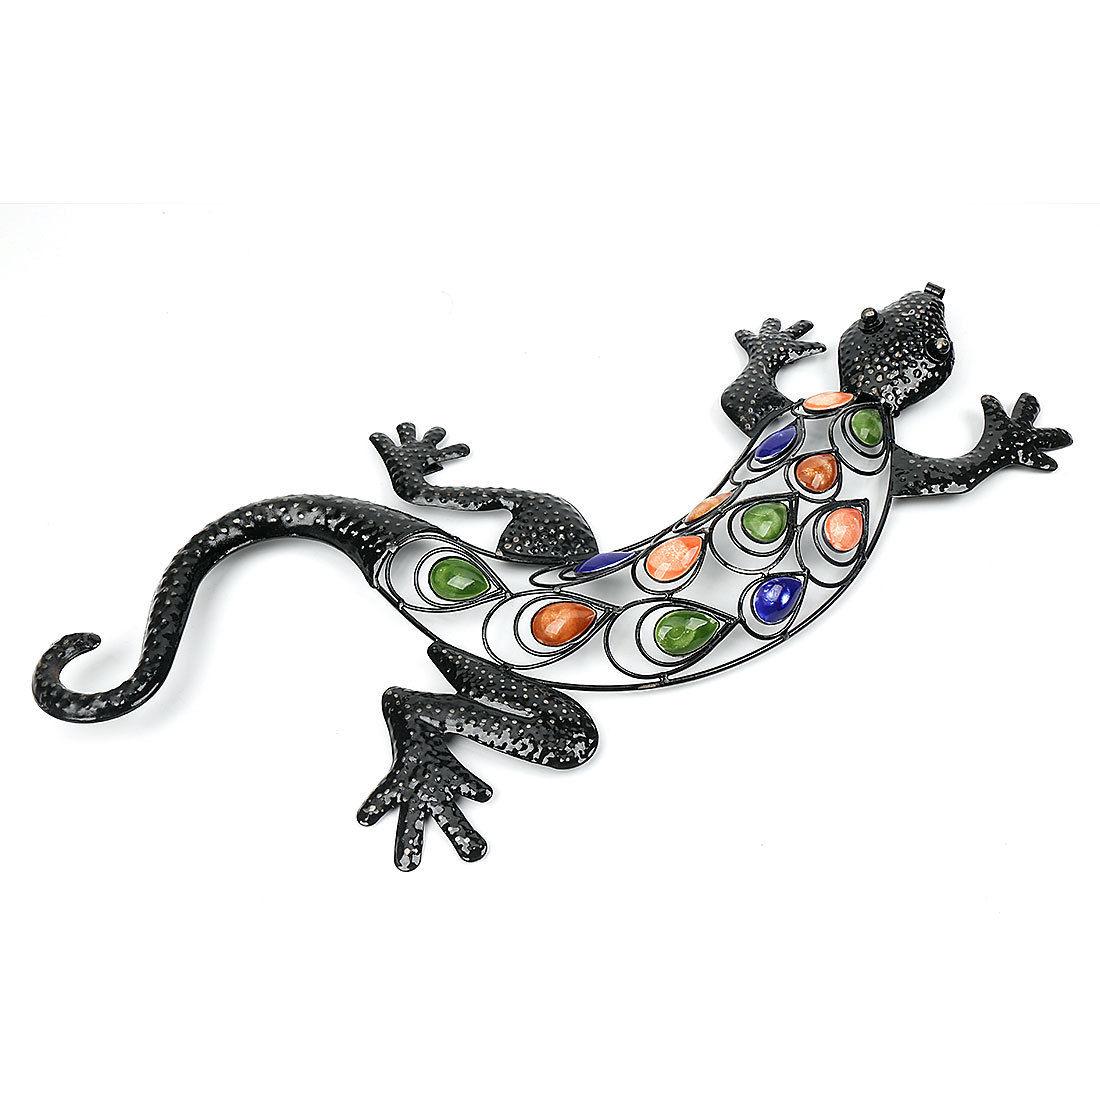 Acrylic Metal Gecko Wall Garden Decor Gecko Sticker Within Gecko Wall Decor (View 24 of 30)